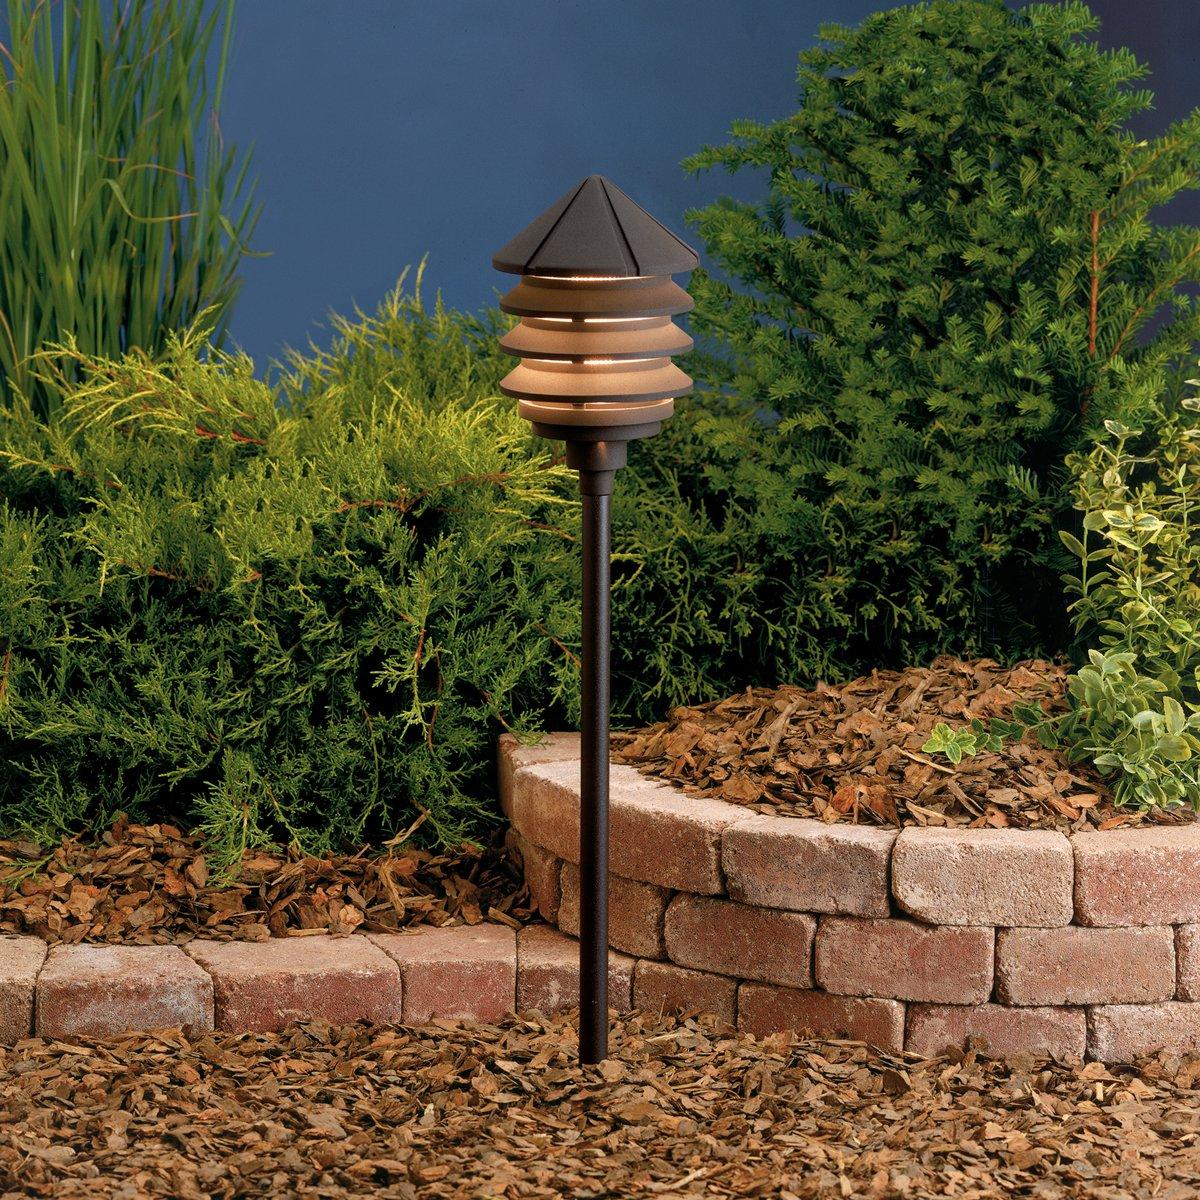 Kichler 15005AZT, Six Groove Low Voltage Post Landscape Path Lighting Fluor, Arch Bronze